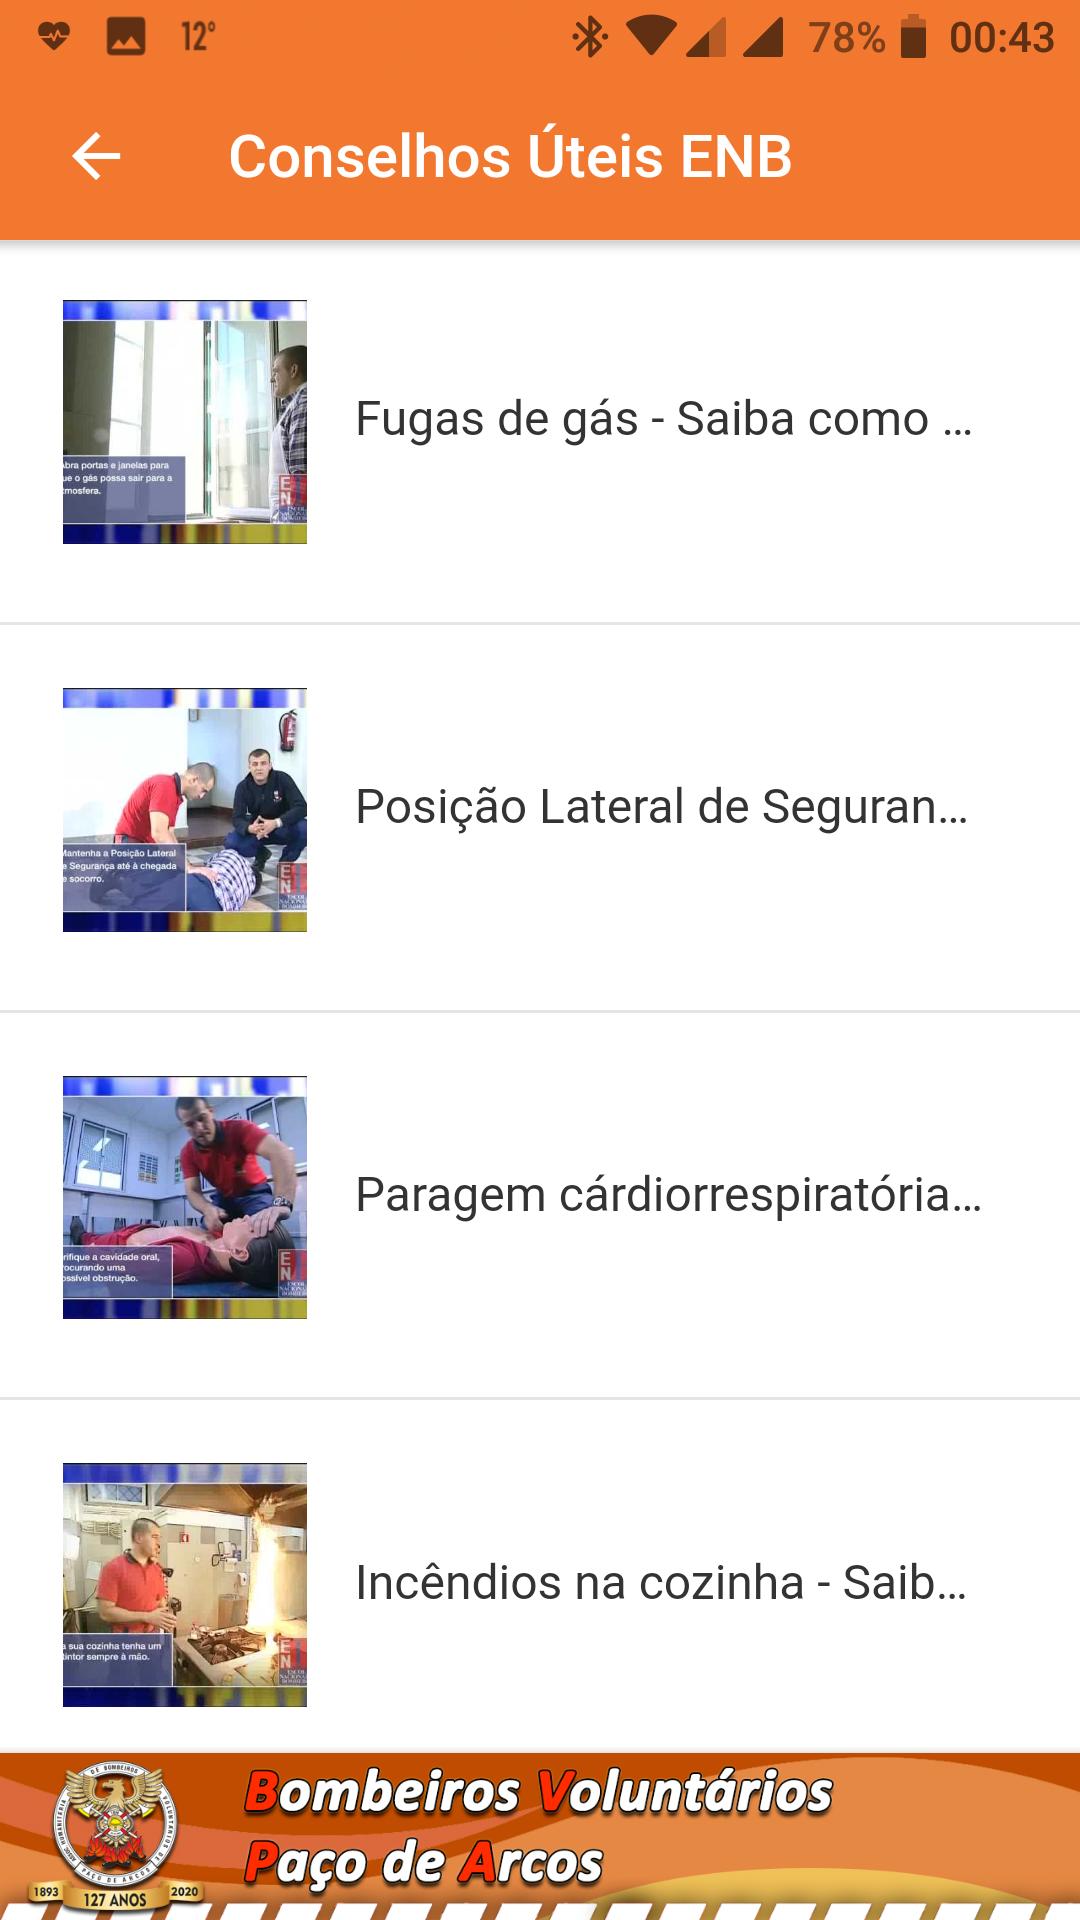 app_bvpacodearcos_20201030 (39)